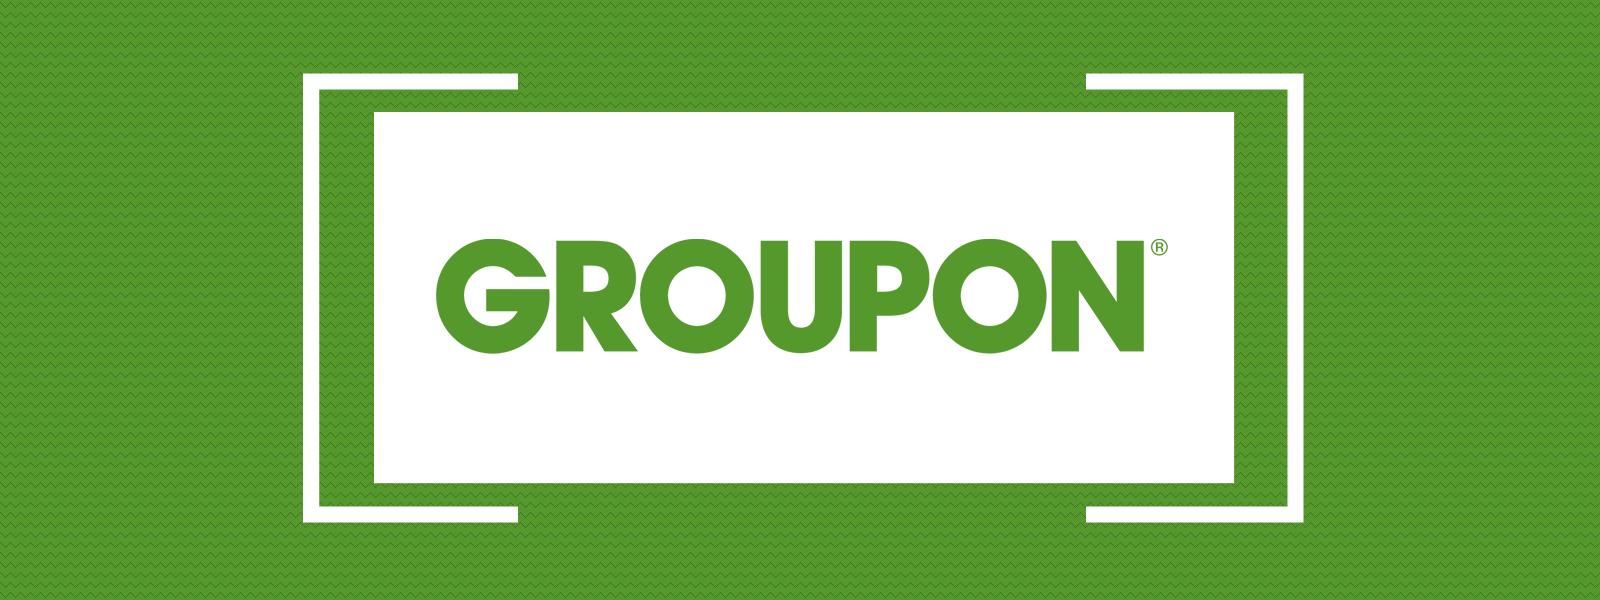 groupon integration